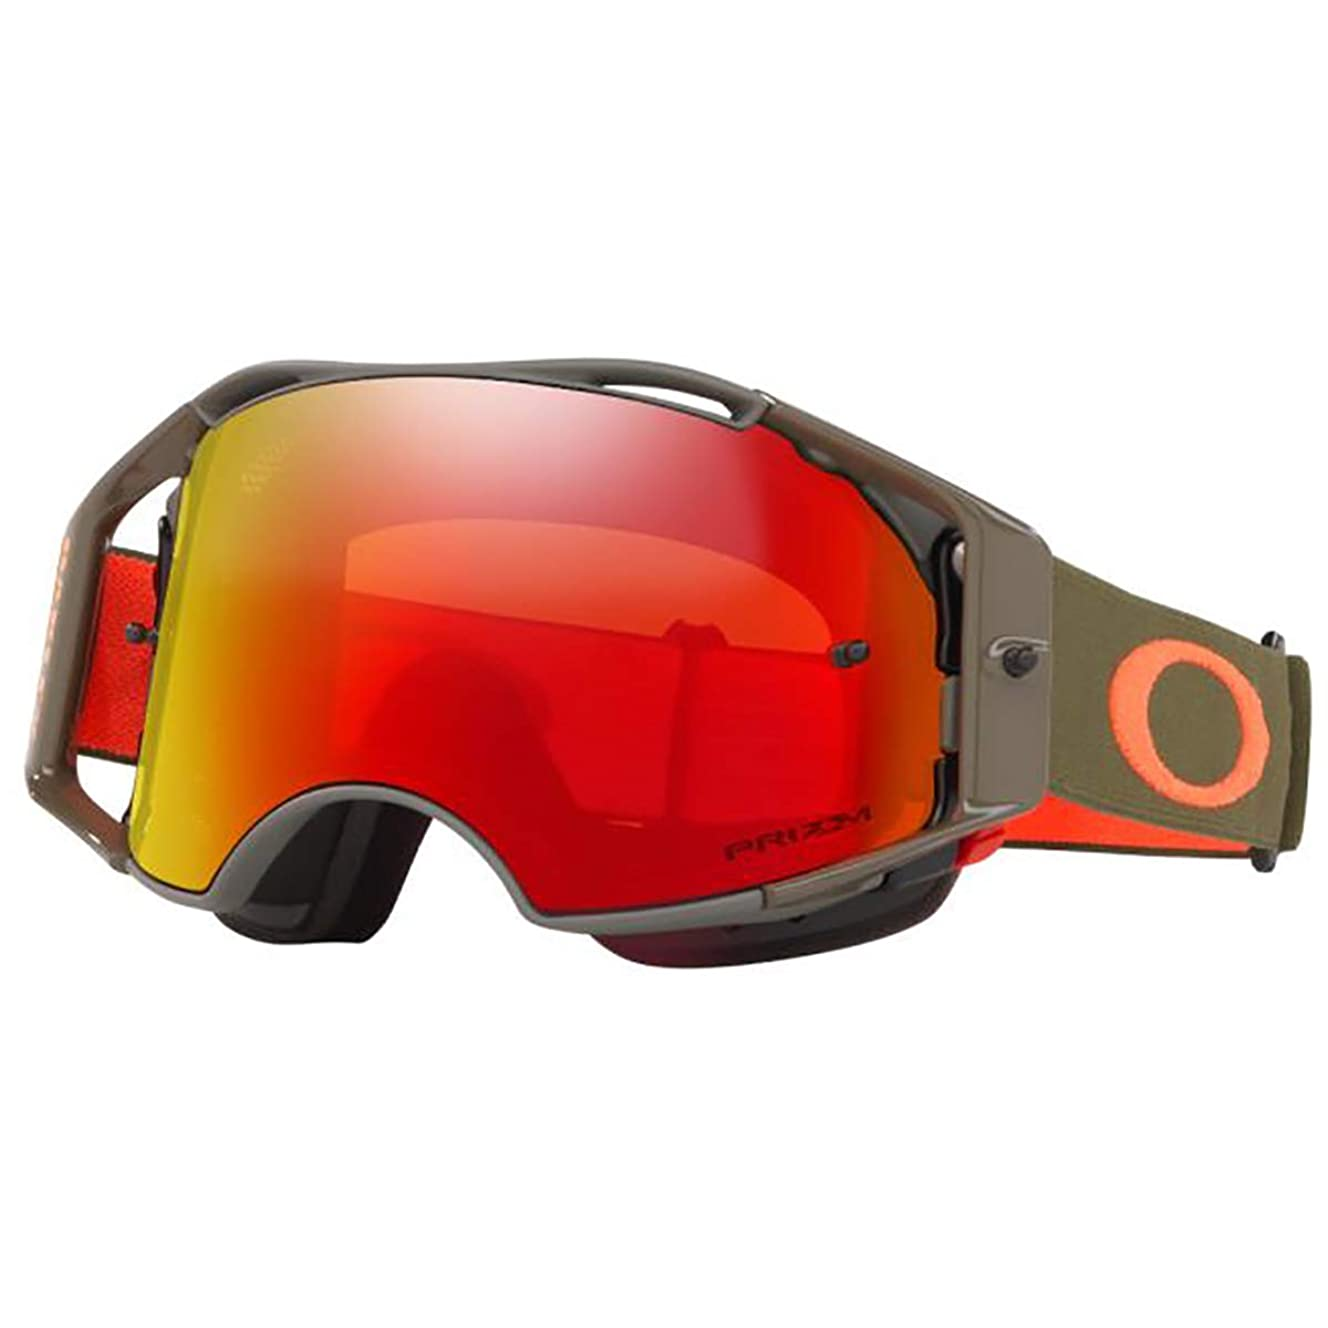 Oakley Airbrake Men's MTB Off-Road Cycling Goggles - Dark Brush Orange/Prizm Trail Torch Iridium/One Size